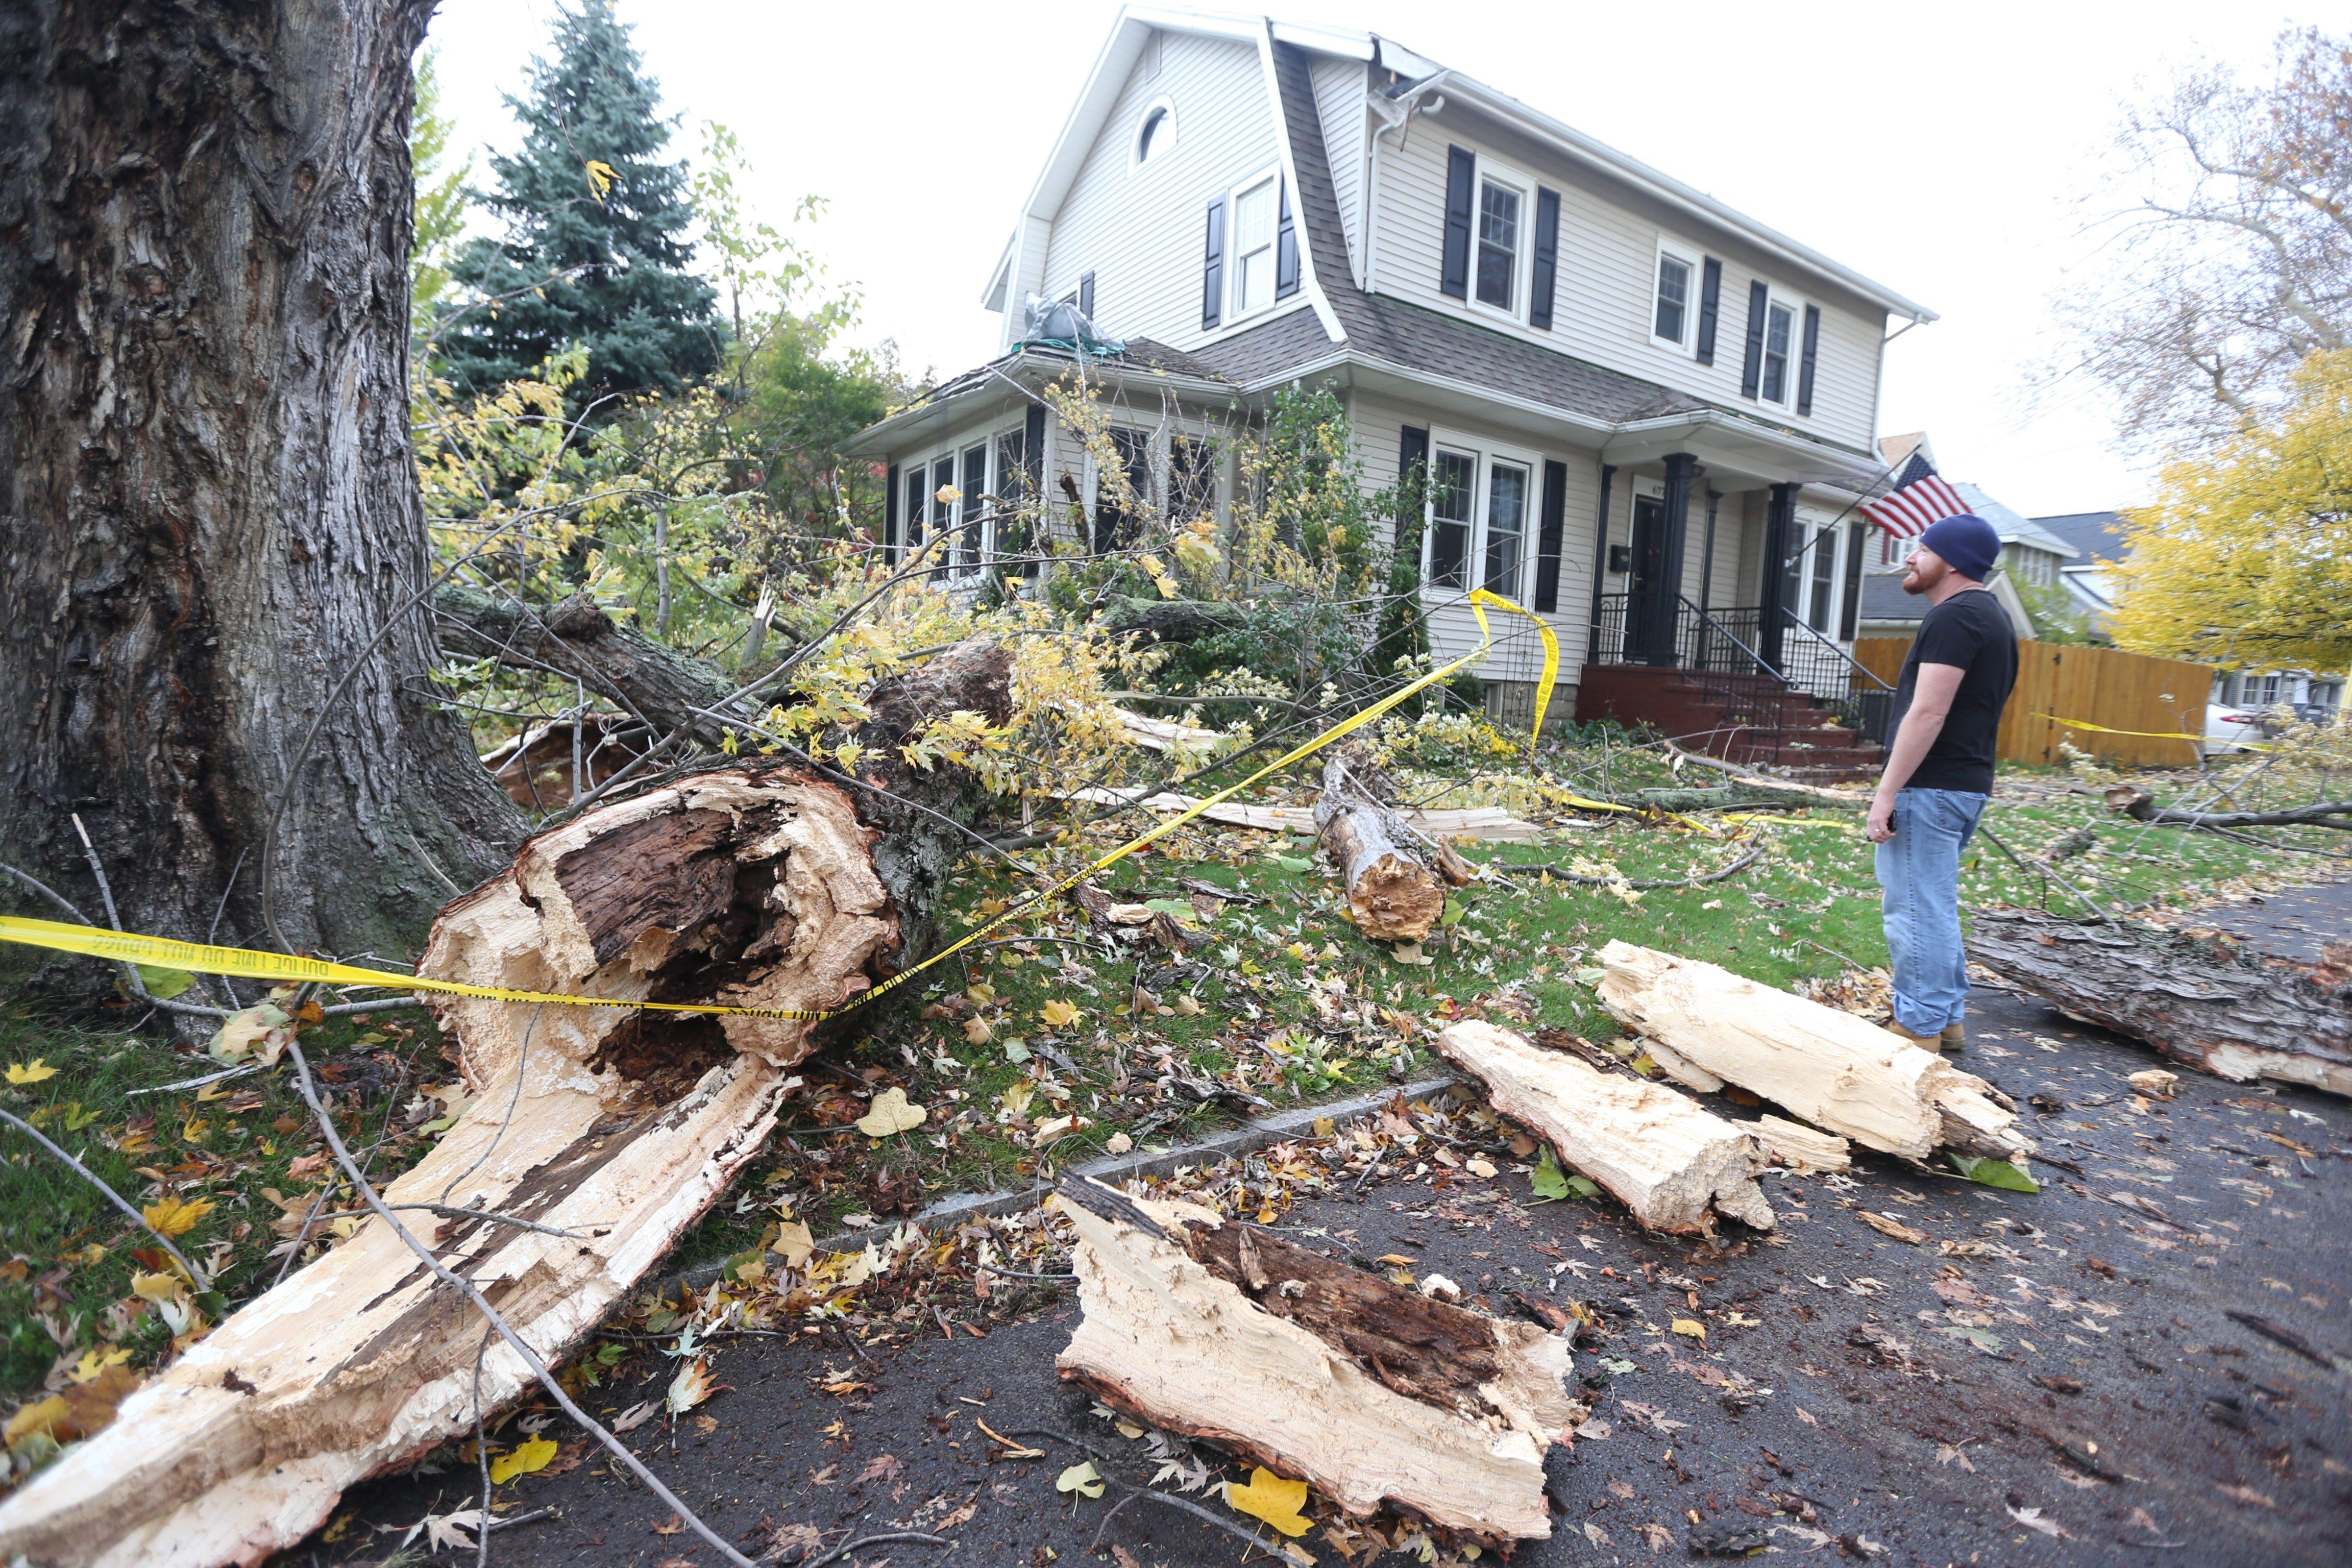 A tree fell on Kyle Fenske's home on McKinley Parkway on Thursday, Oct. 29, 2015.  (John Hickey/Buffalo News)